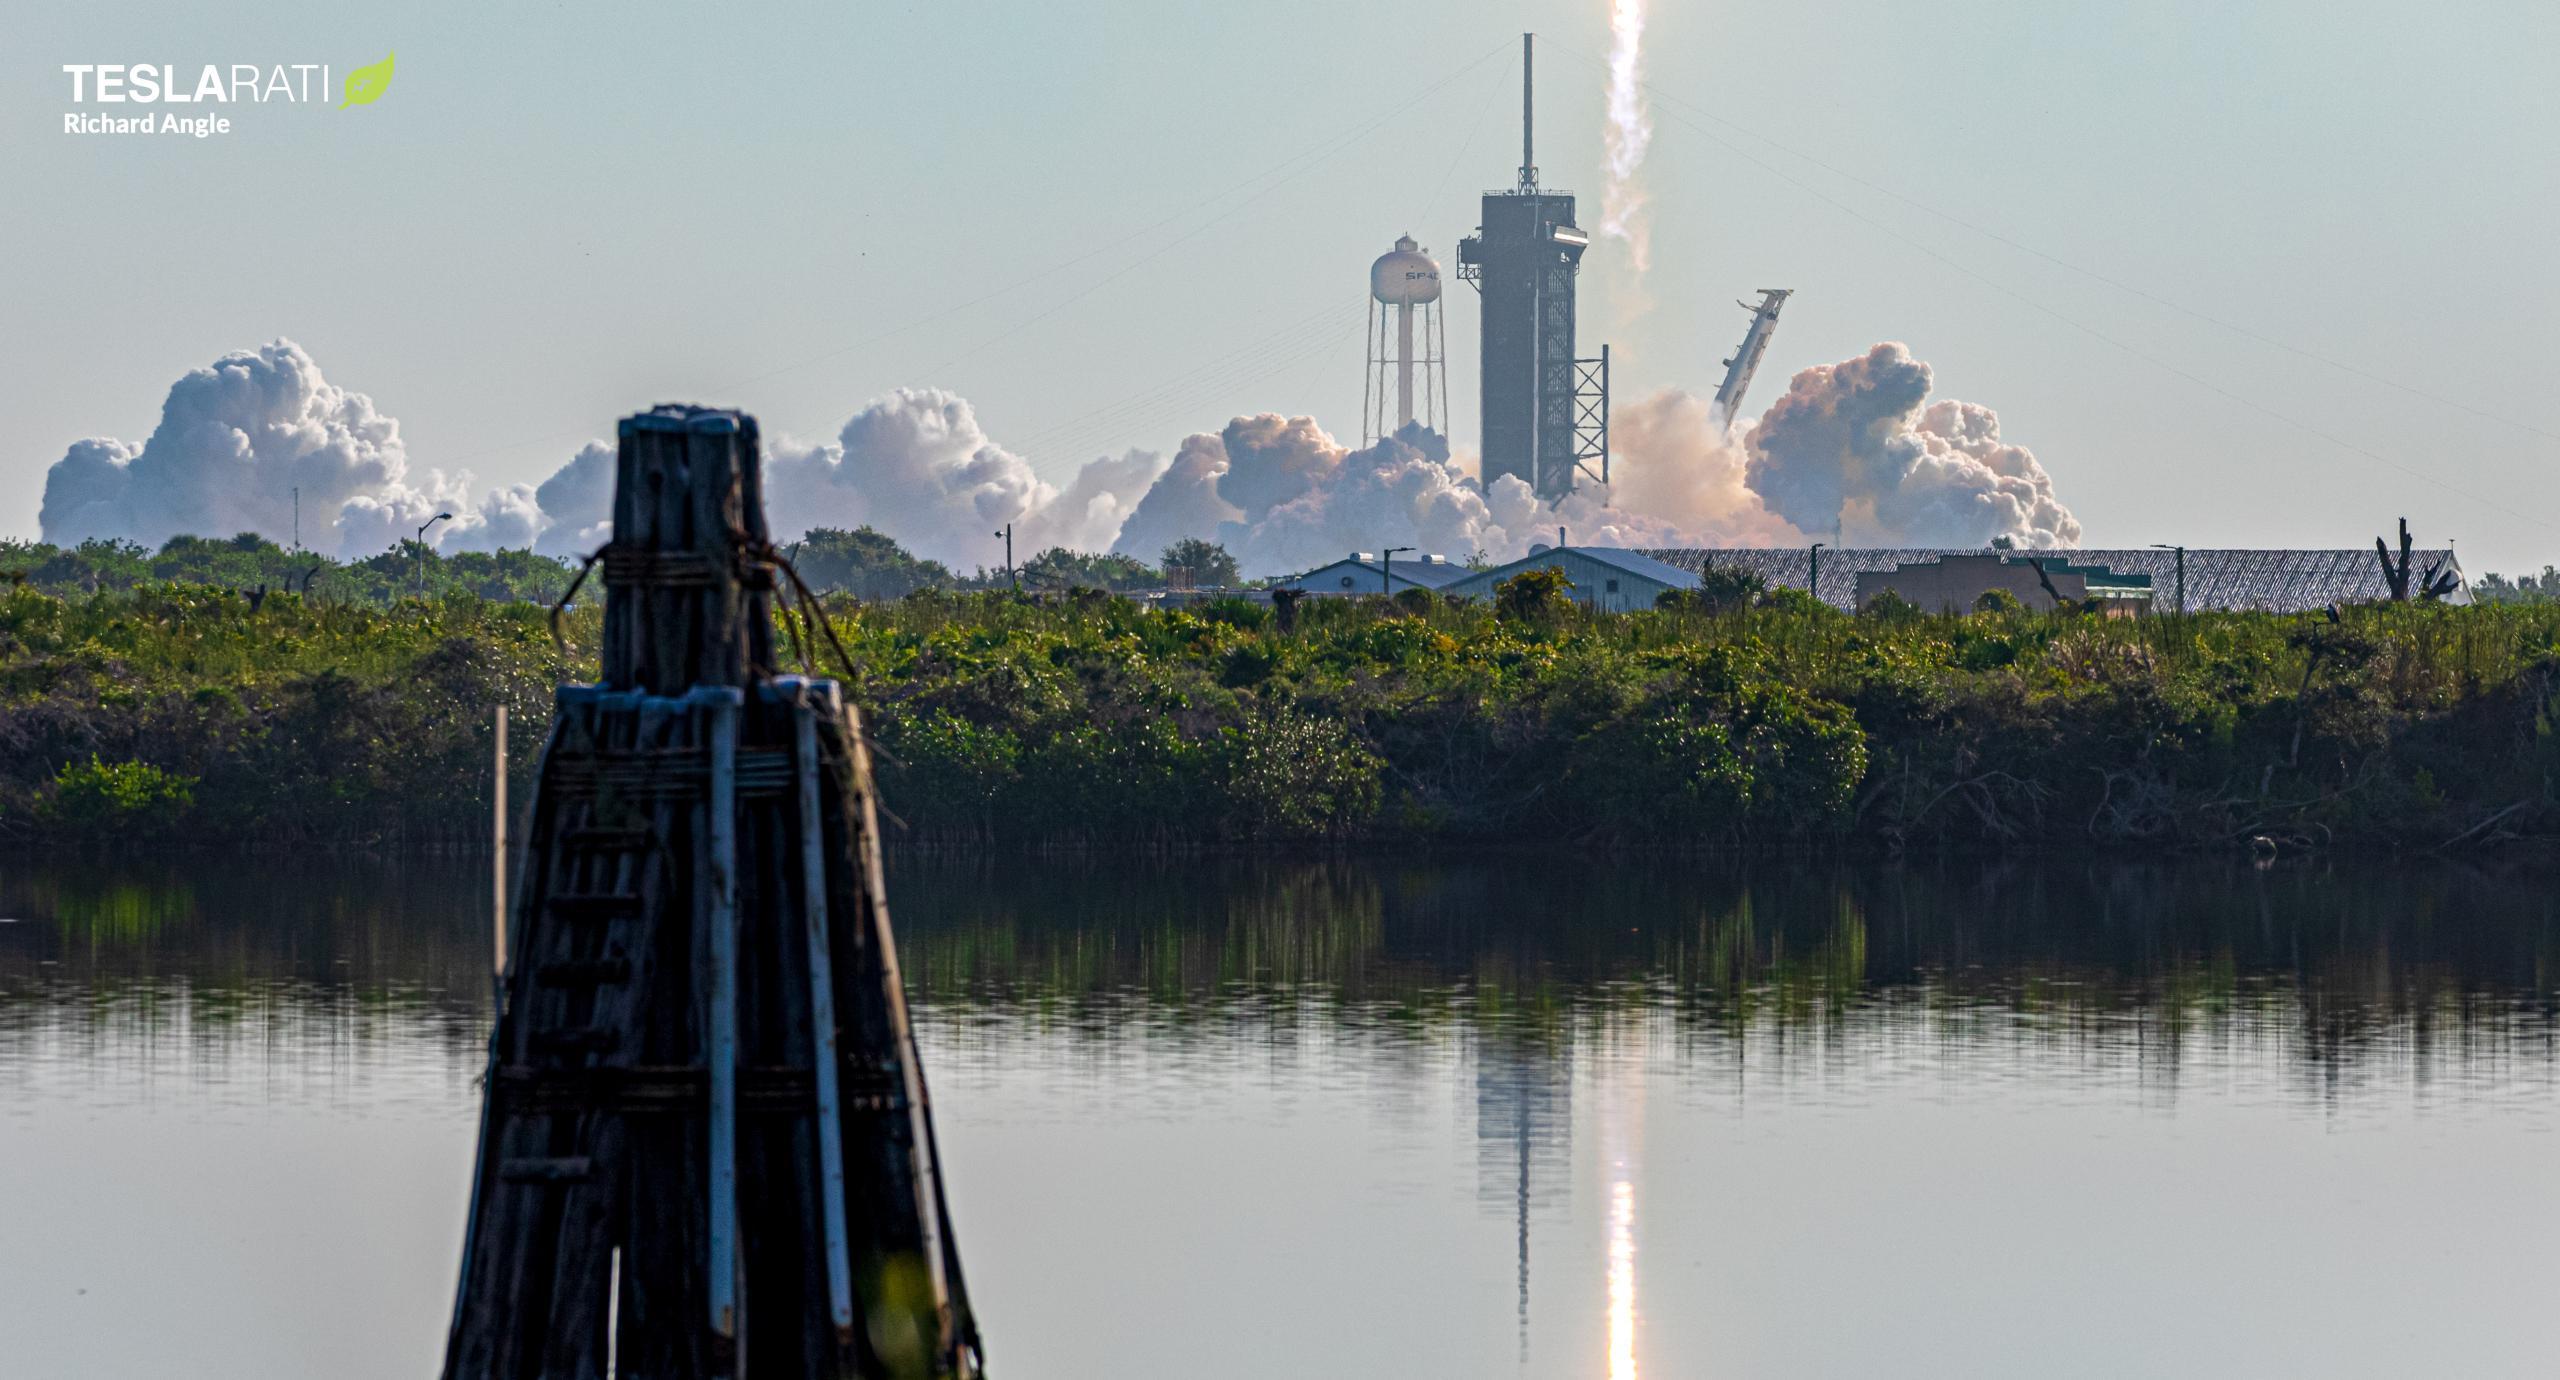 Starlink-11 Falcon 9 B1060 LC-39A 090320 (Richard Angle) launch 2 crop (c)